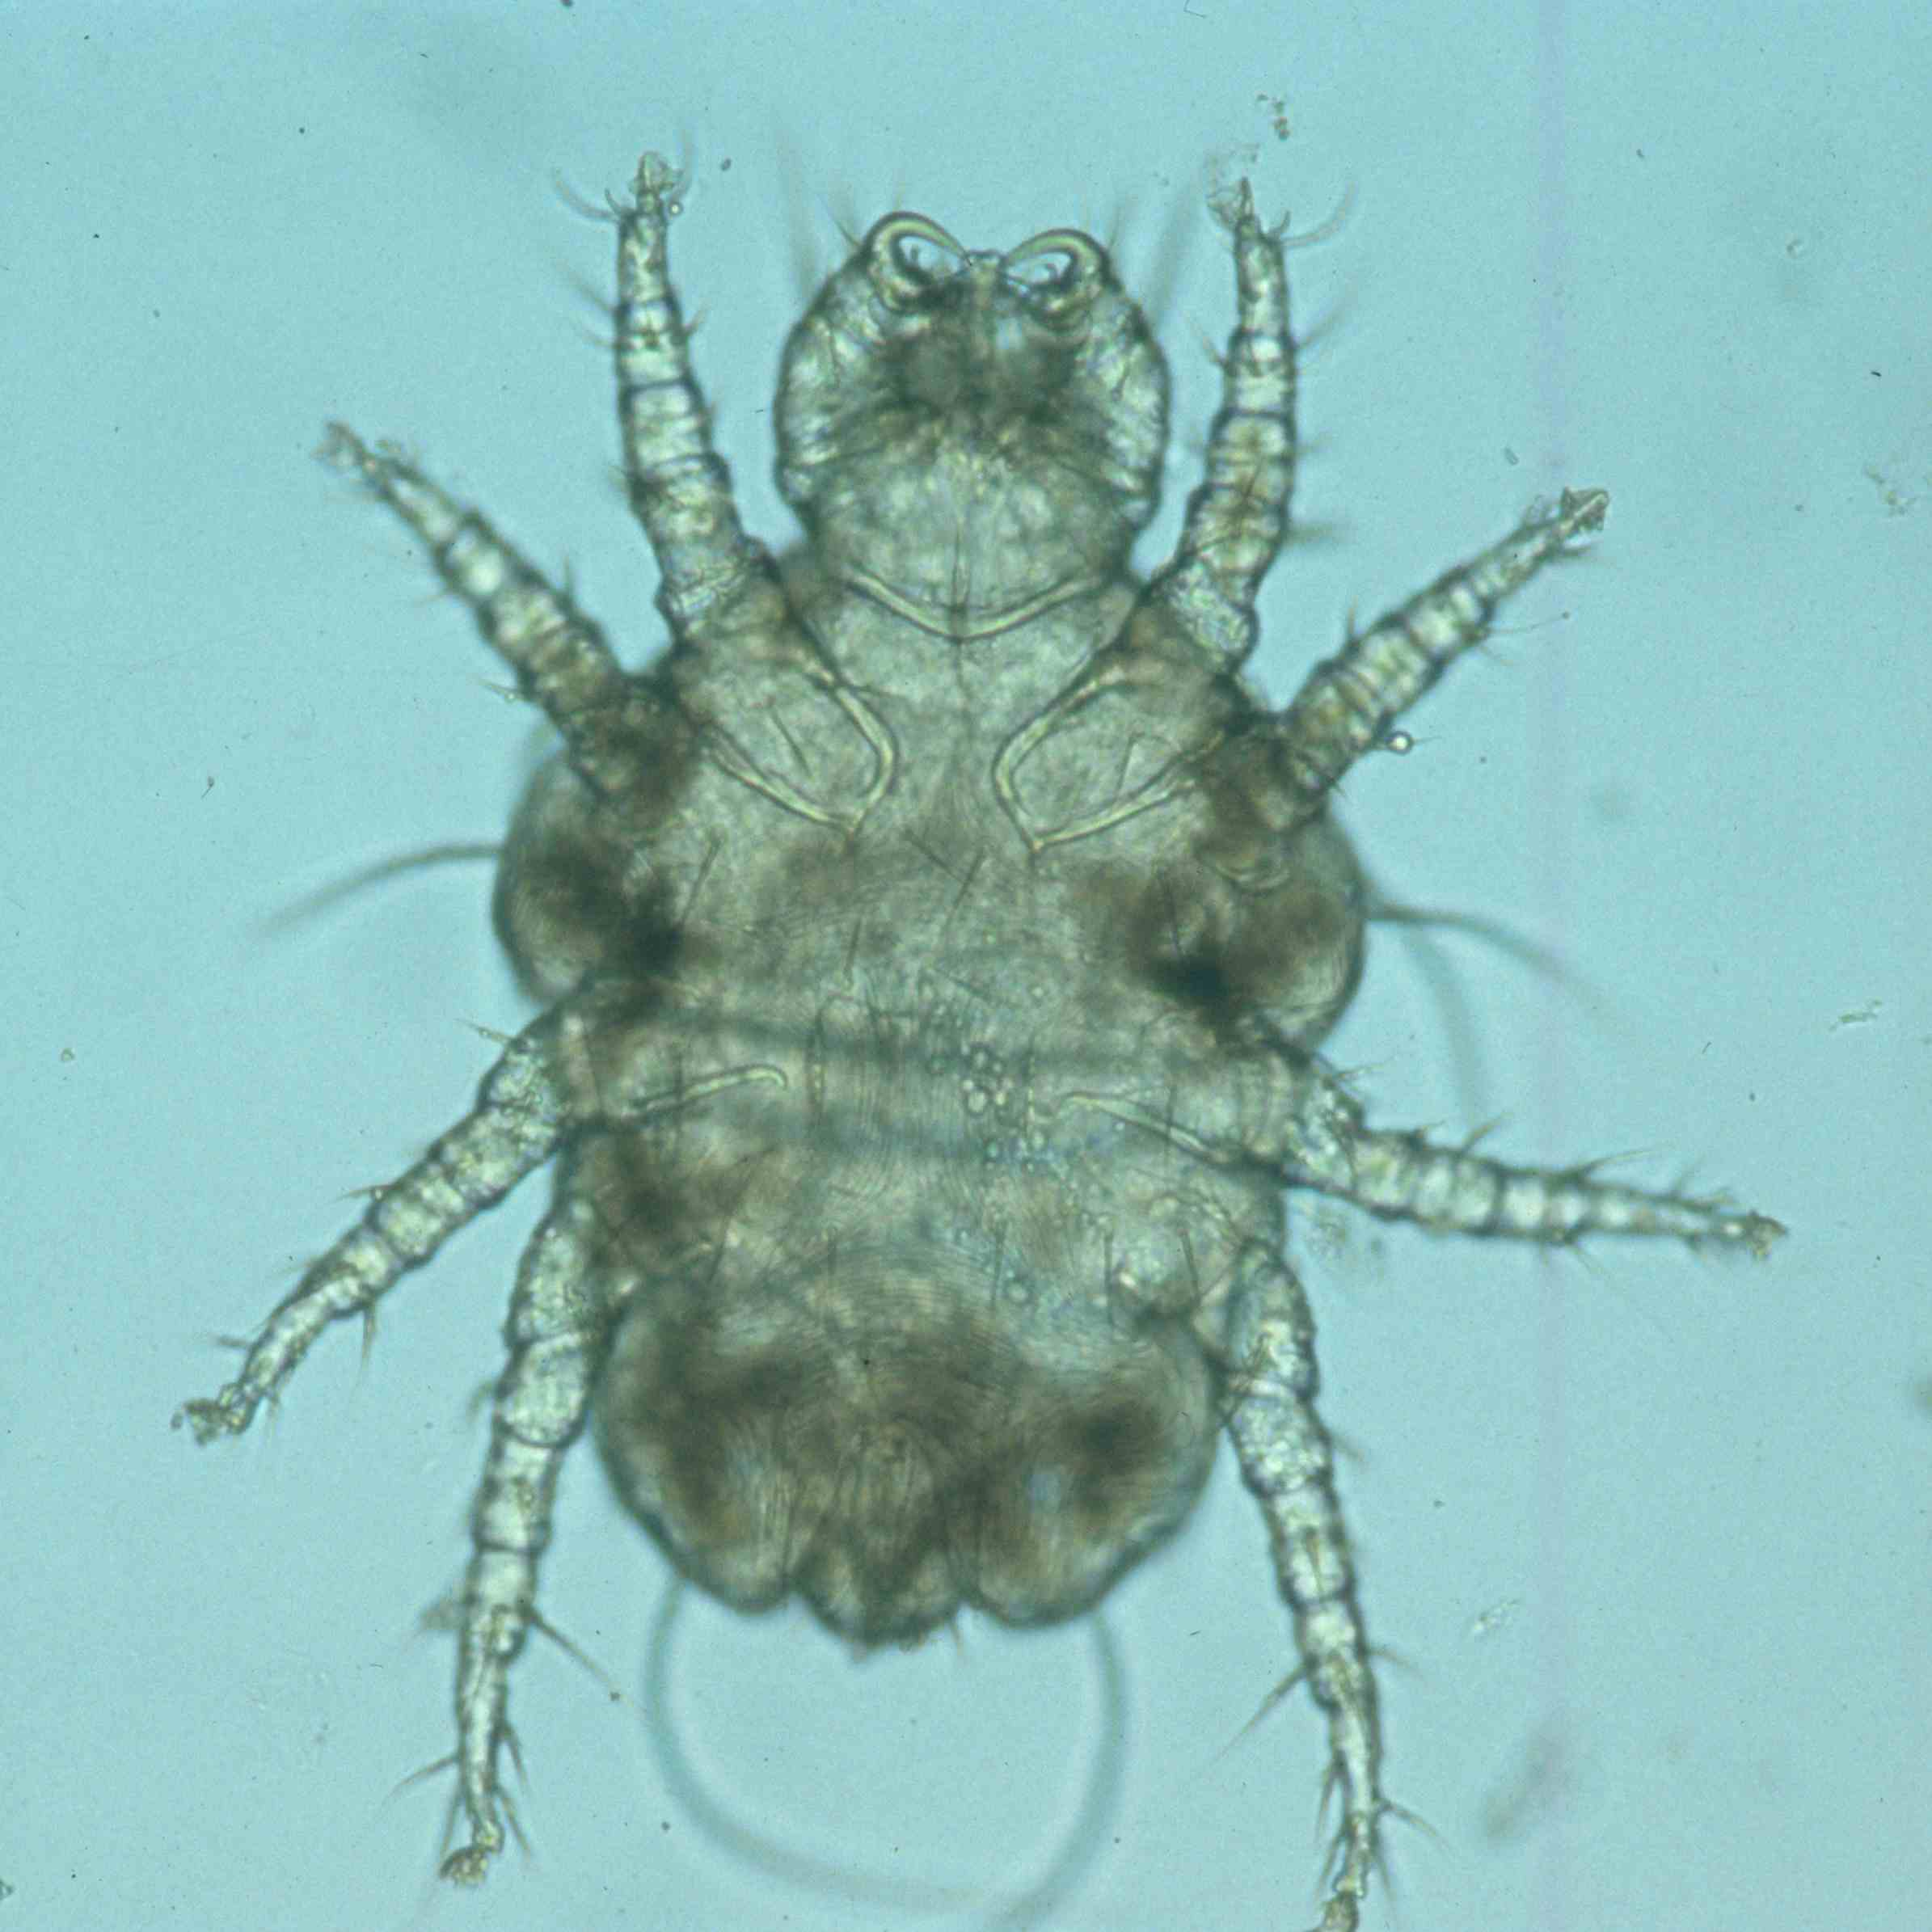 Cheyletiella Mites